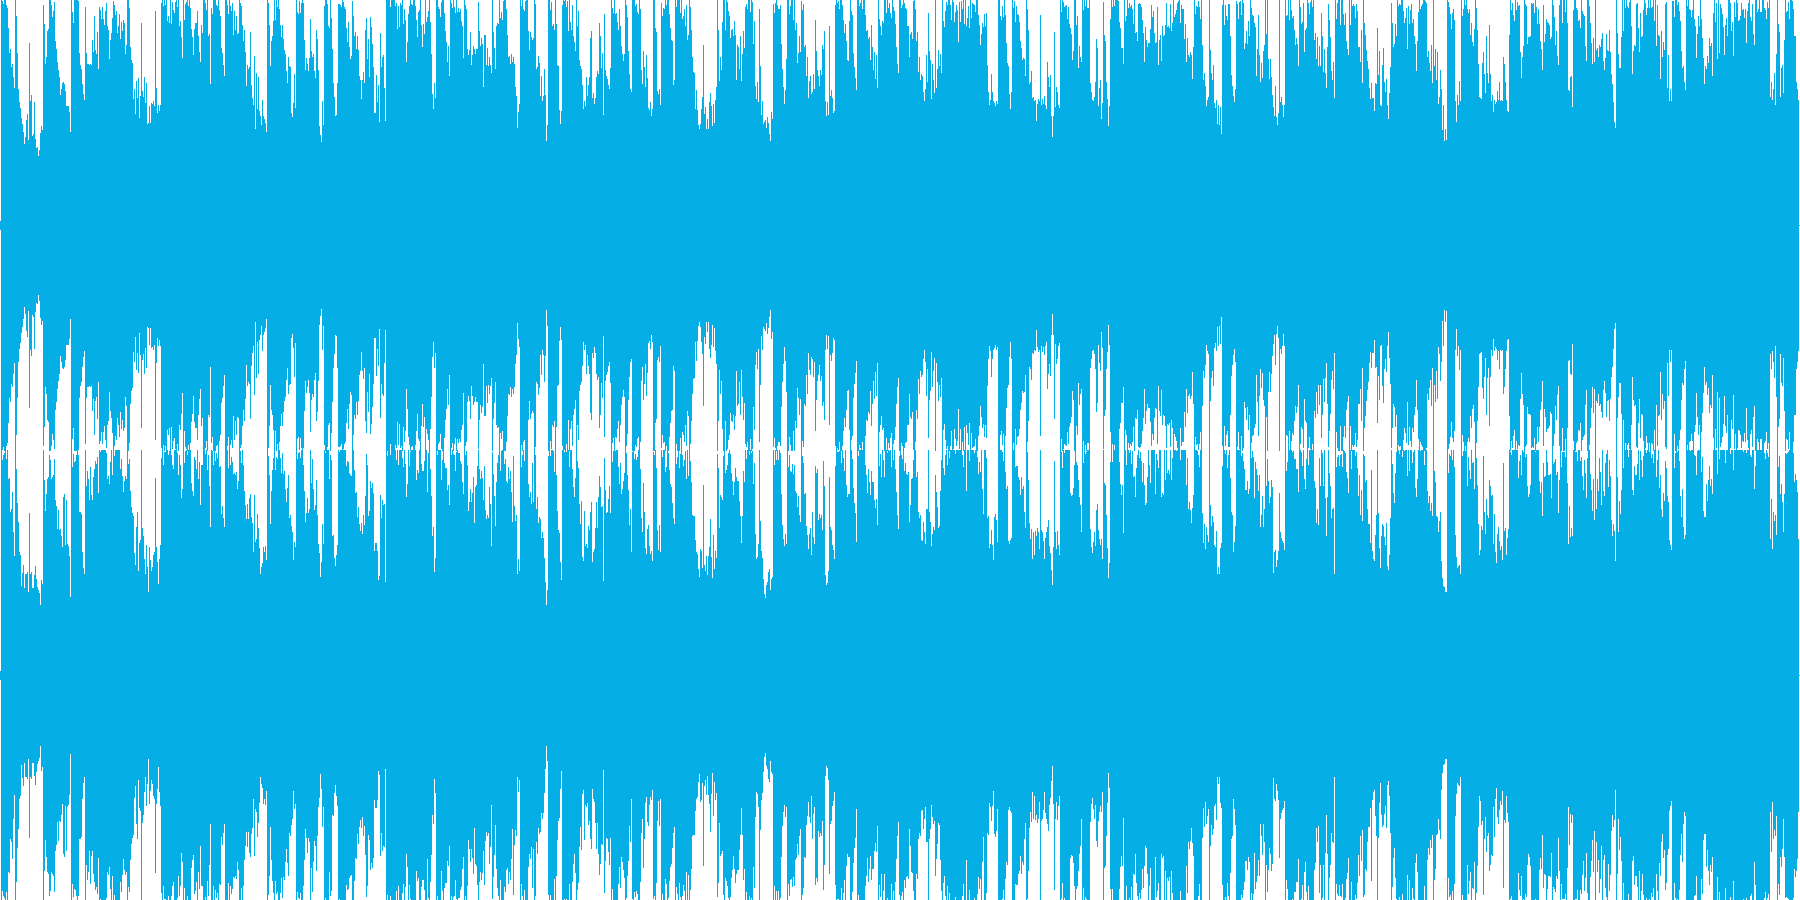 MOTIF XSの美しいエレクトリック…の再生済みの波形